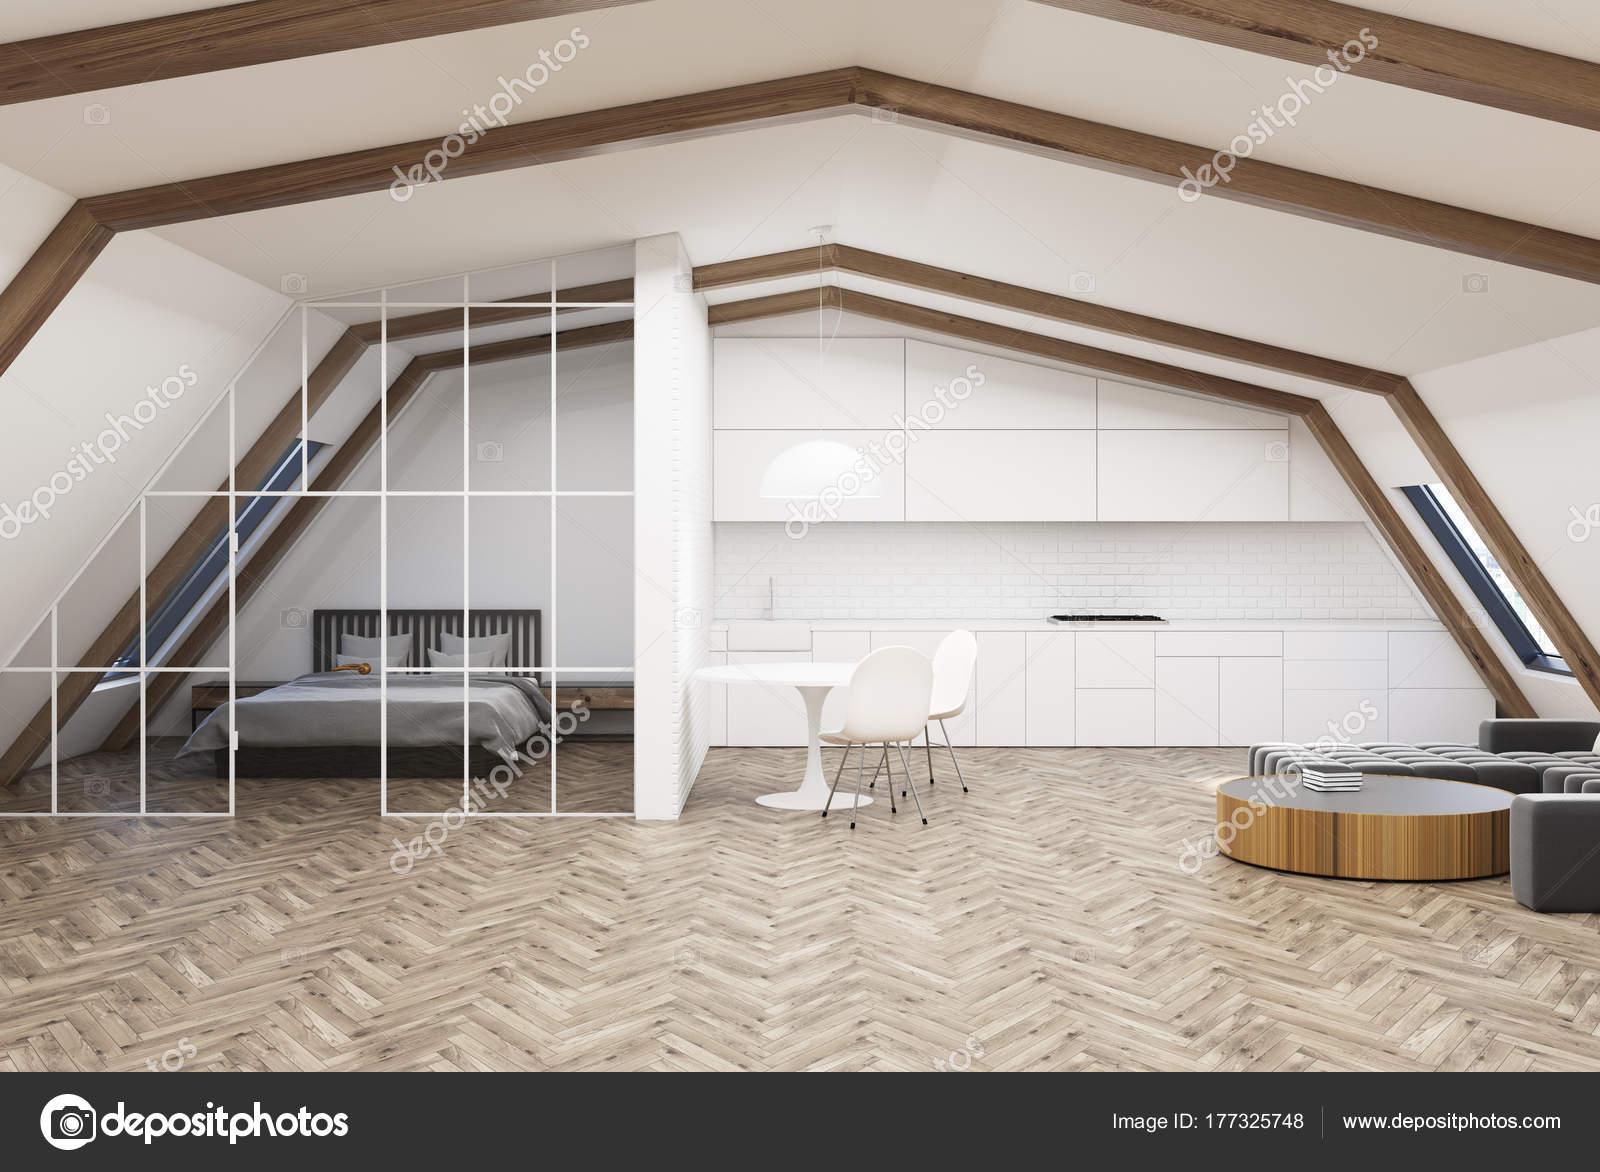 Wohnzimmer Grau Holz : Attic wohnzimmer grau sofa bett holz u2014 stockfoto © denisismagilov